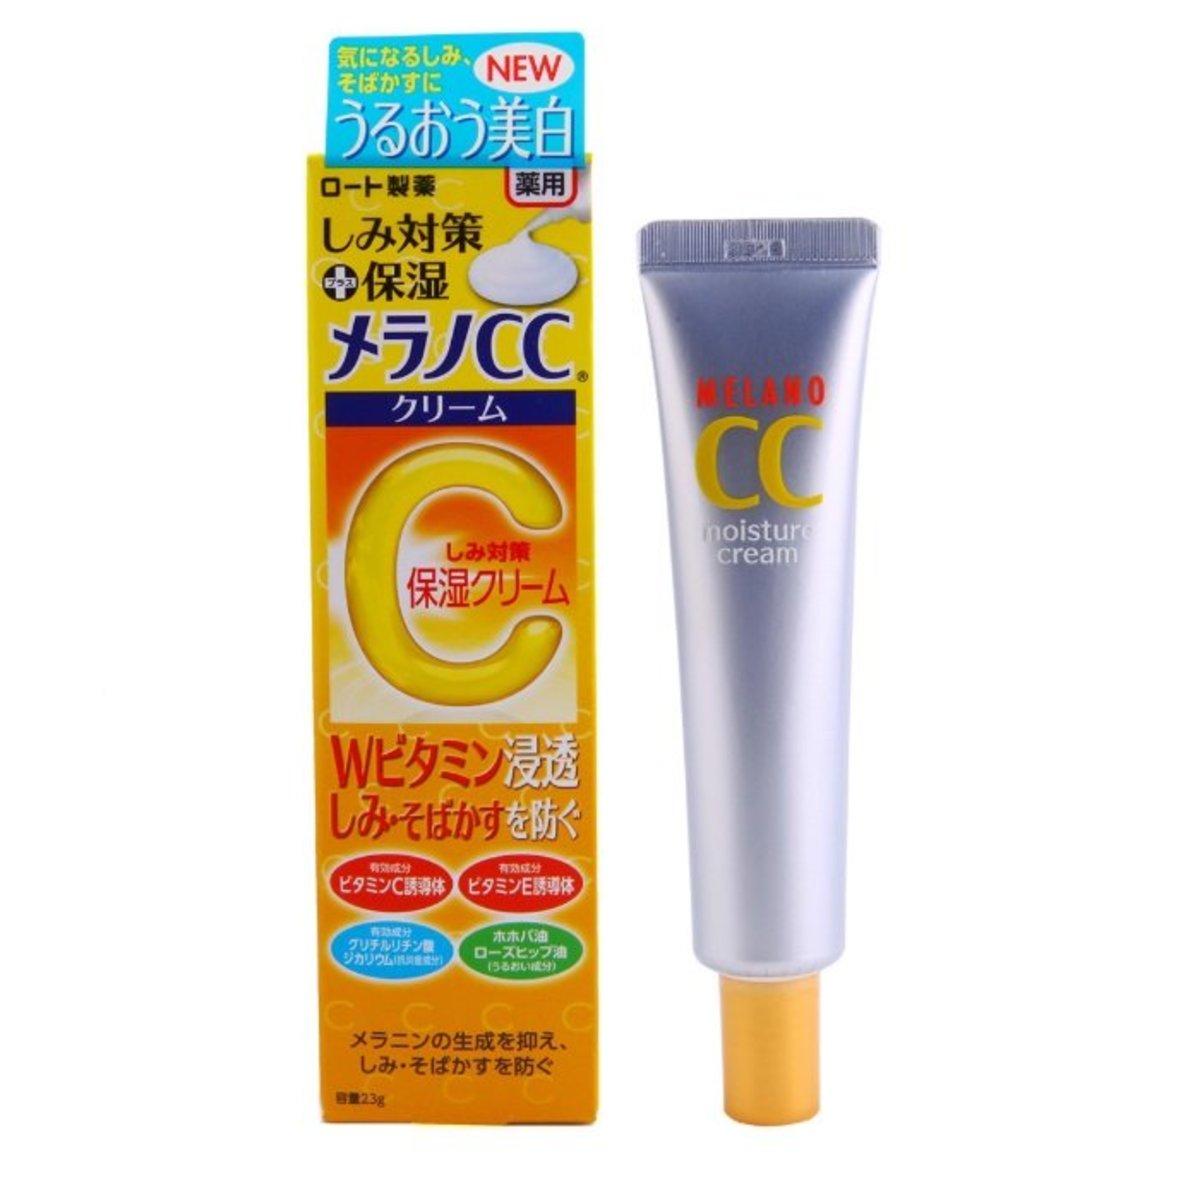 Melano CC-   Whitening Cream 23g (4987241160013 )  [Parallel Import Product]